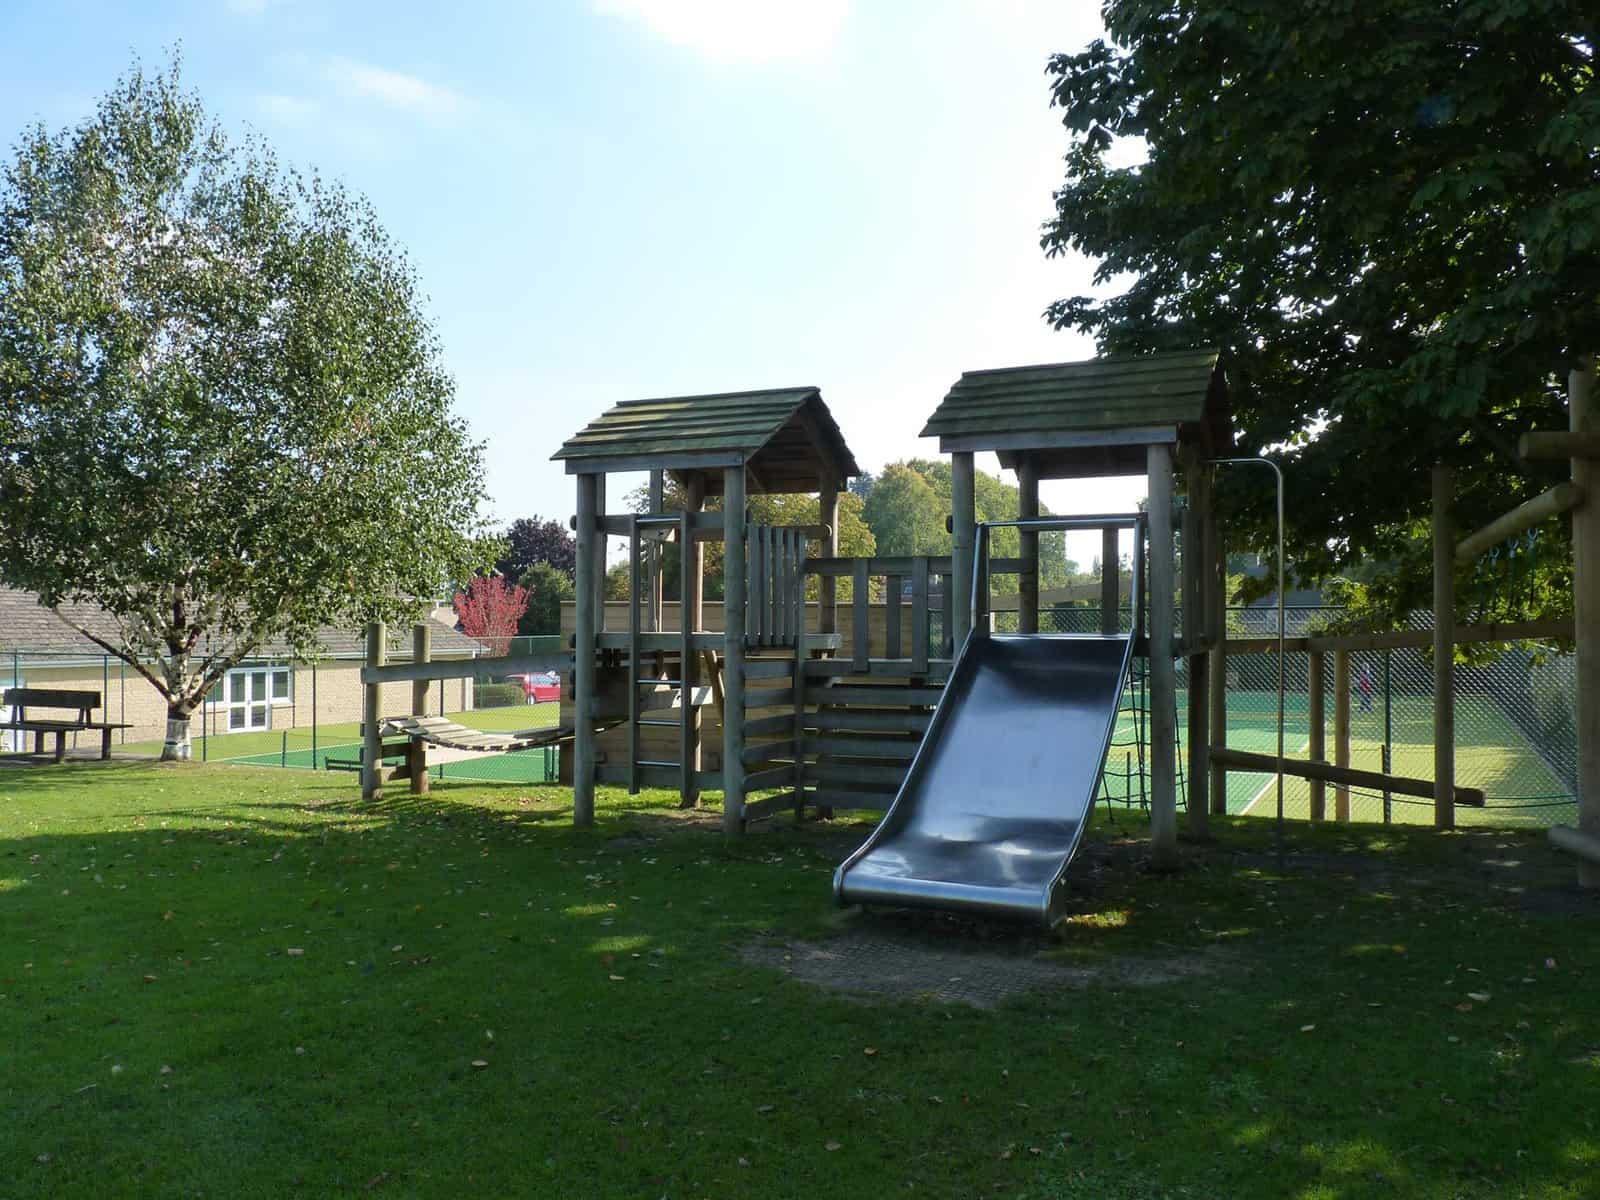 Shipton-under-Wychwood Playground